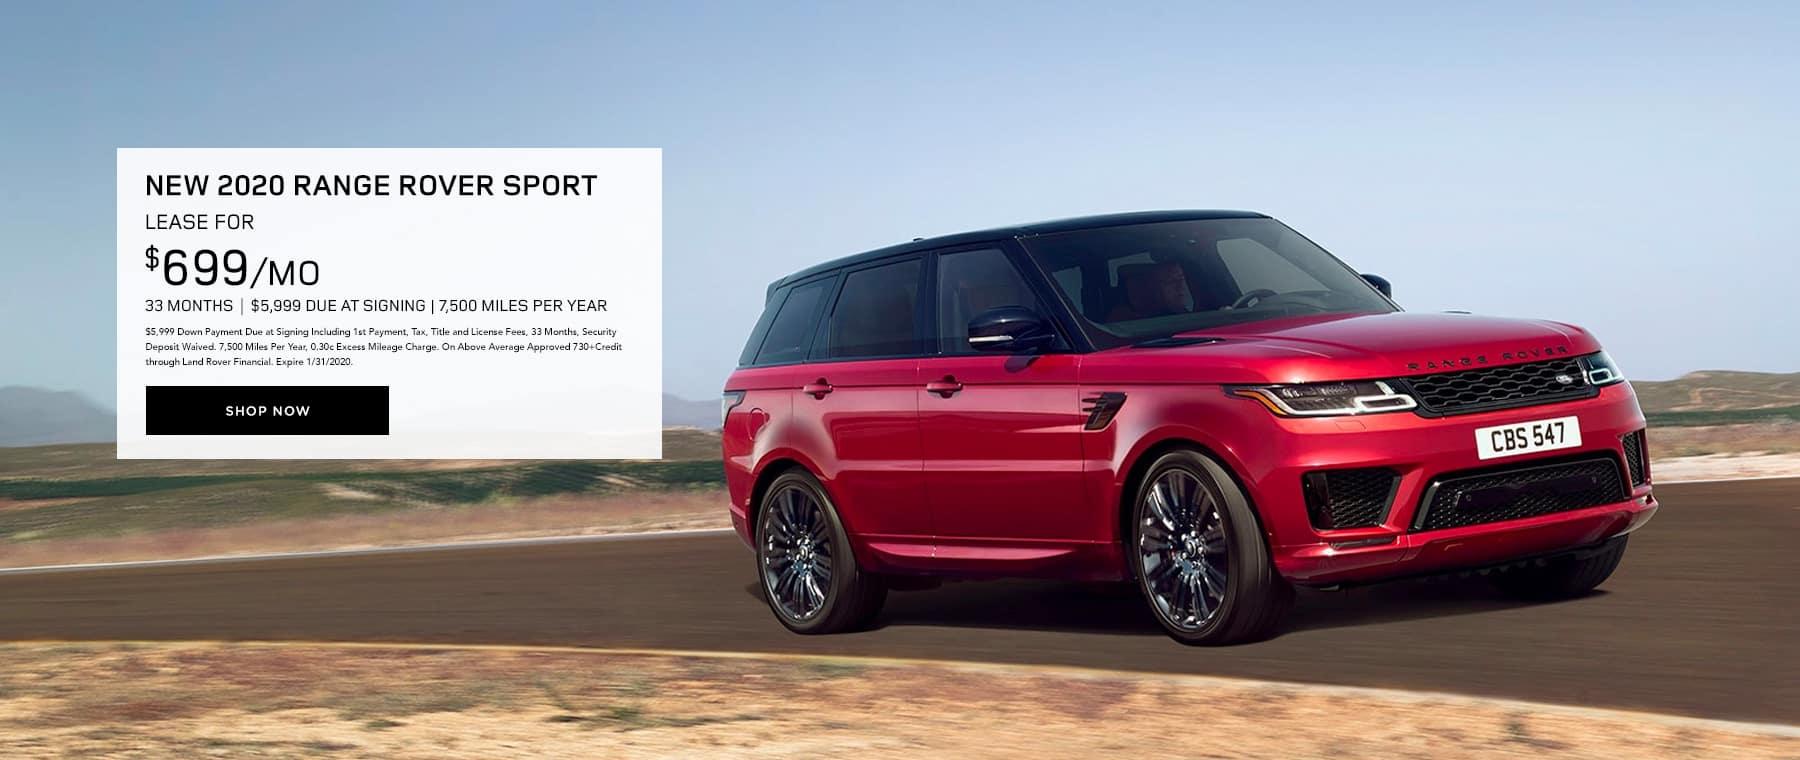 Lease New 2020 Range Rover Sport